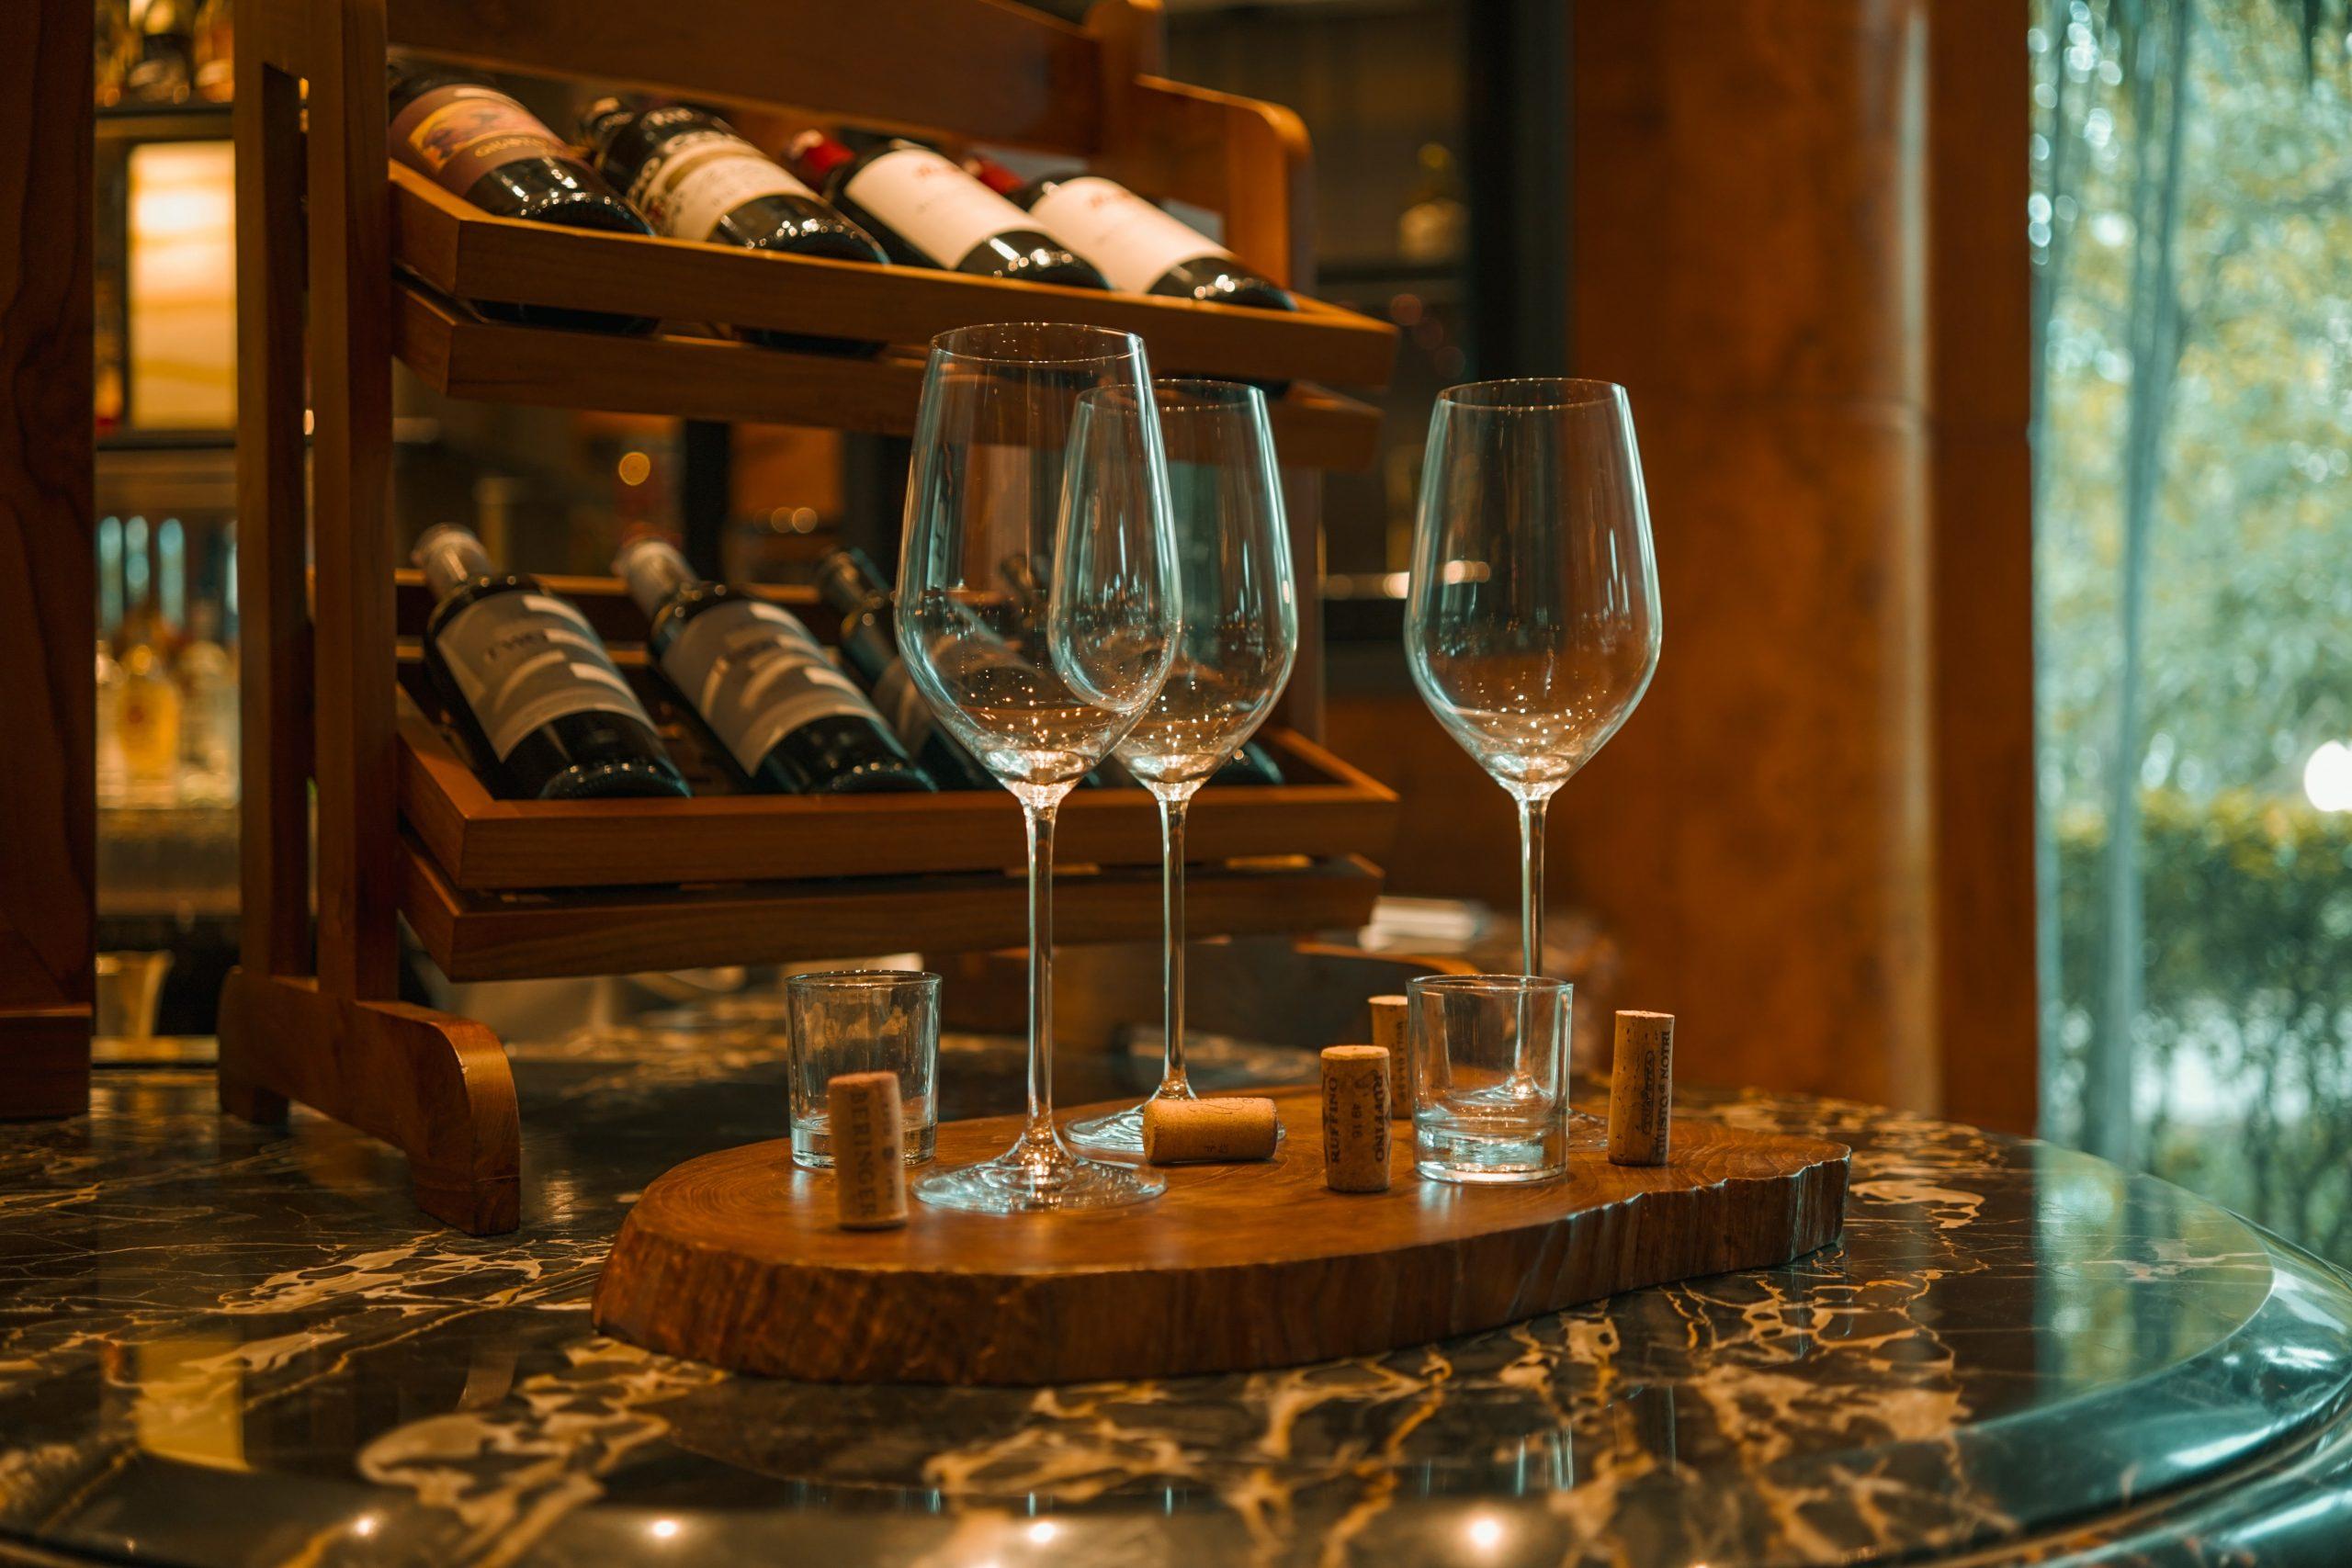 A photo of three wine glasses